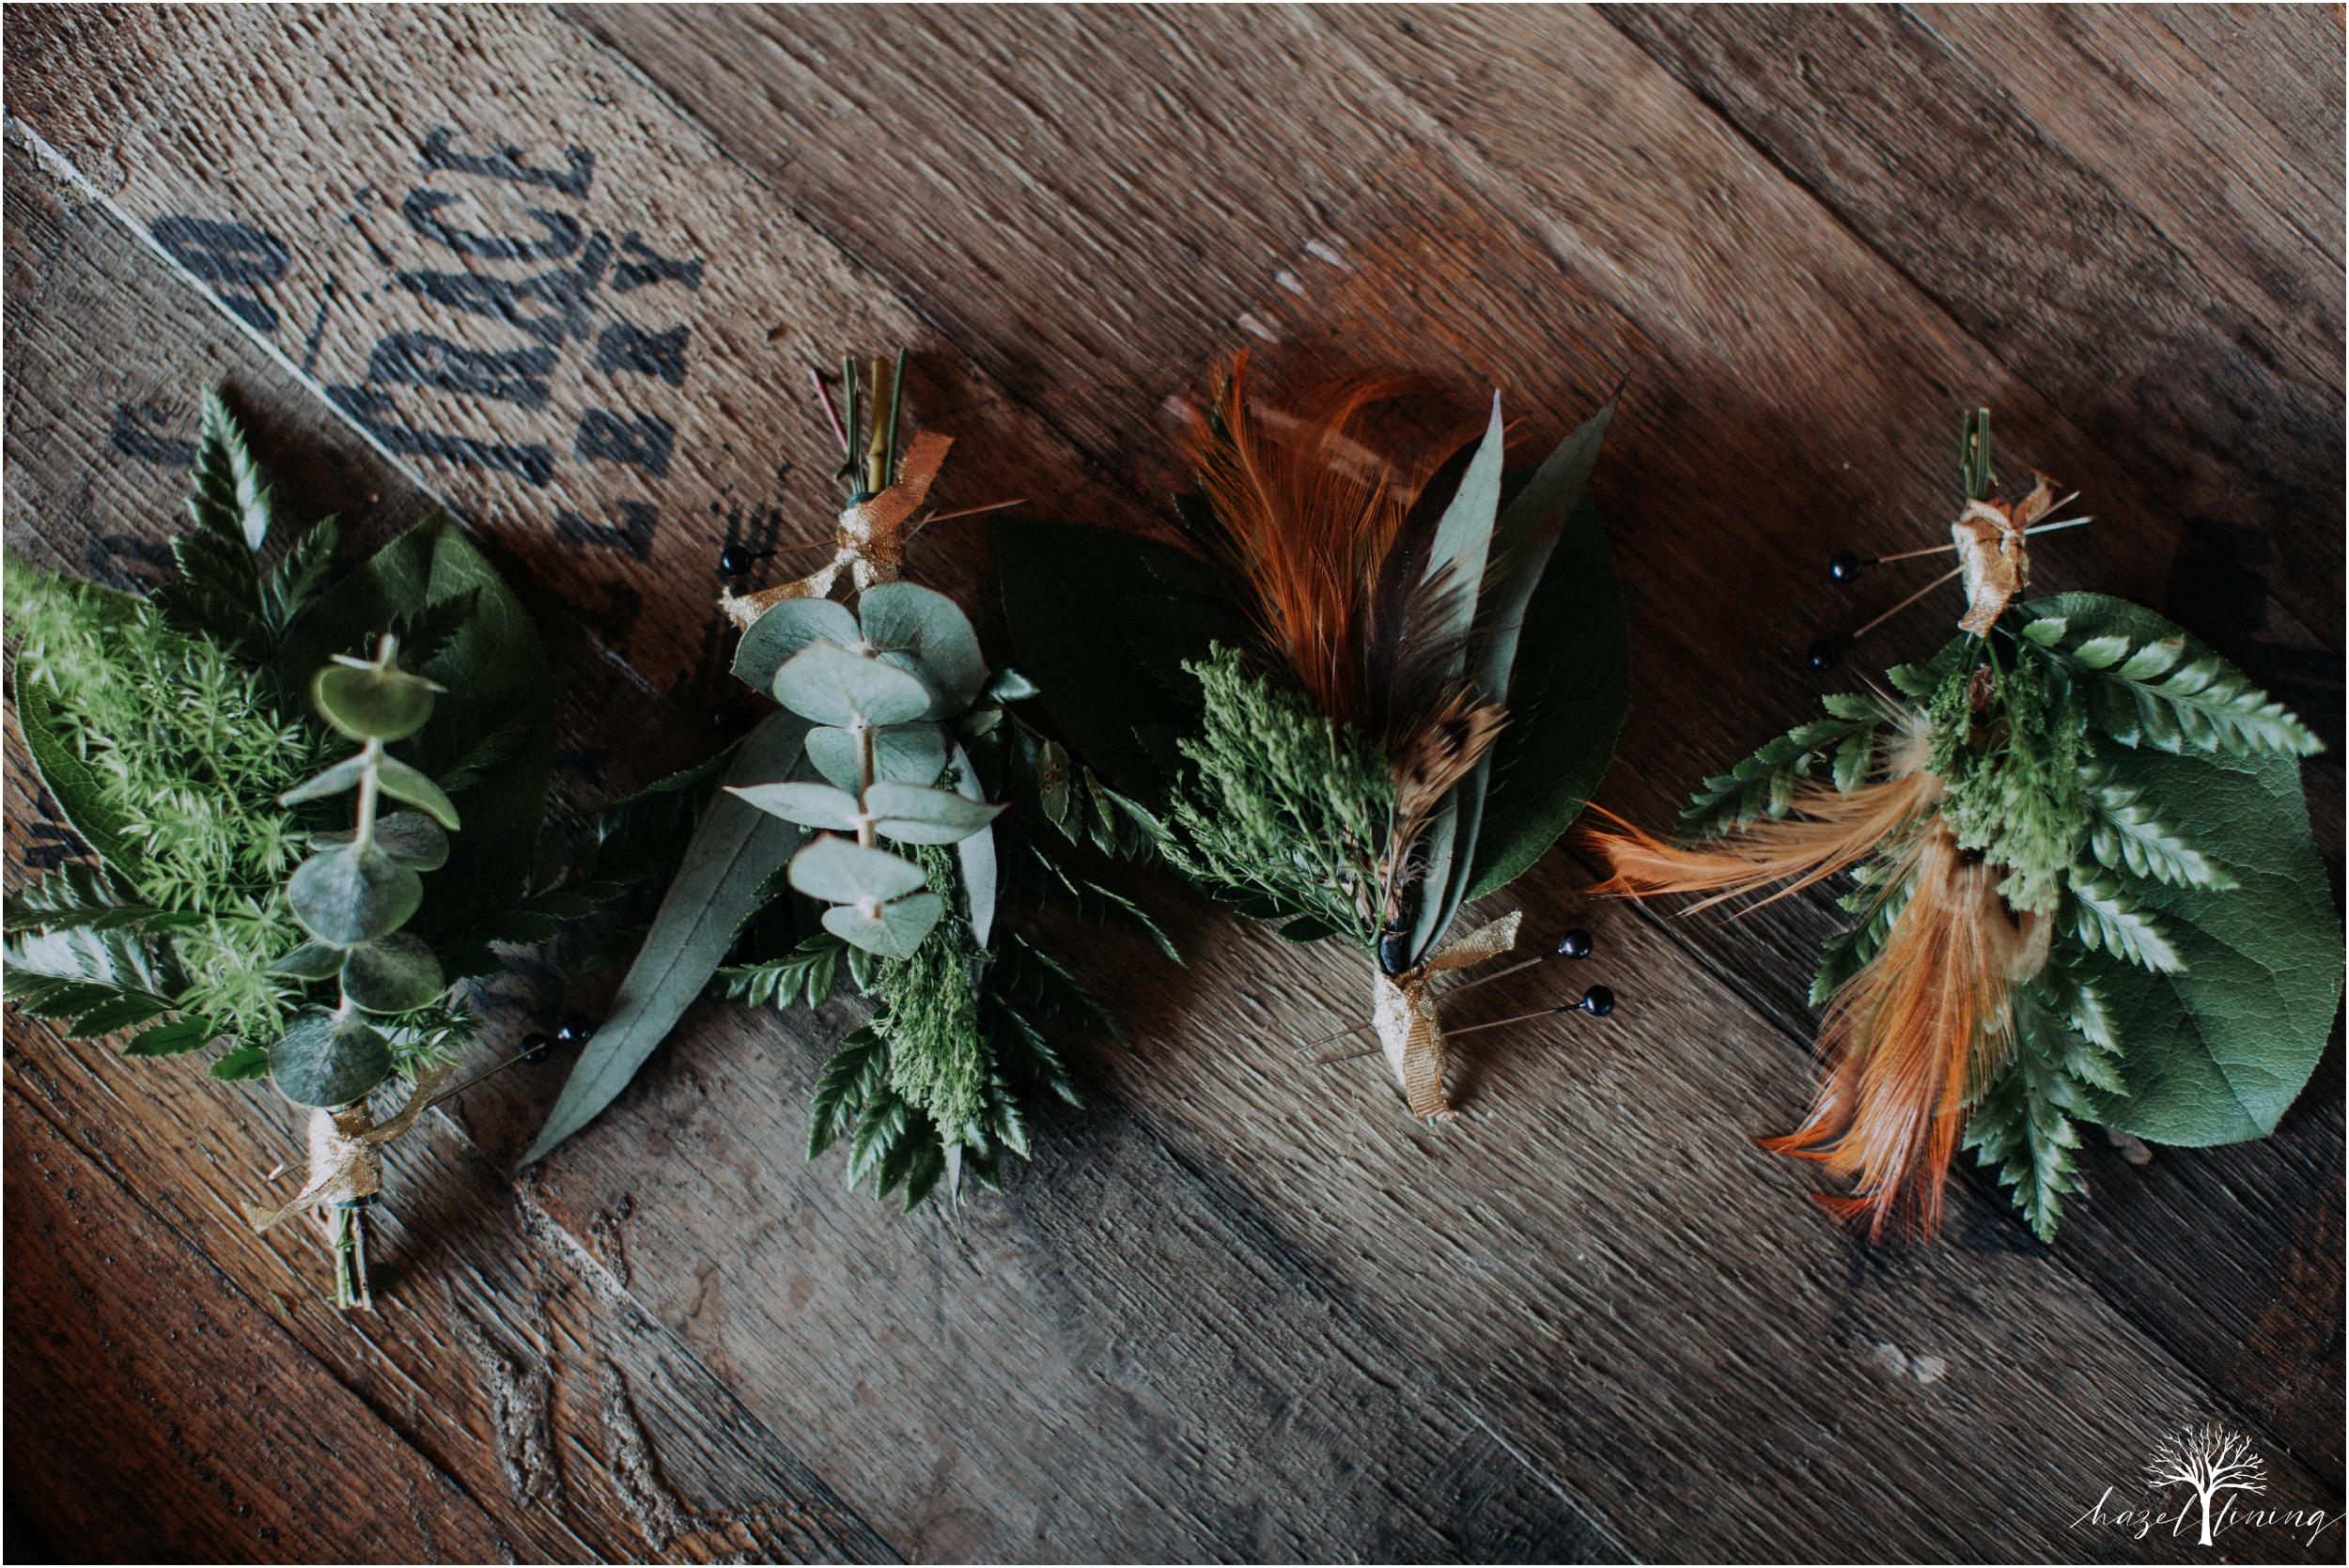 hazel-lining-travel-wedding-elopement-photography-lisa-landon-shoemaker-the-farm-bakery-and-events-bucks-county-quakertown-pennsylvania-summer-country-outdoor-farm-wedding_0035.jpg